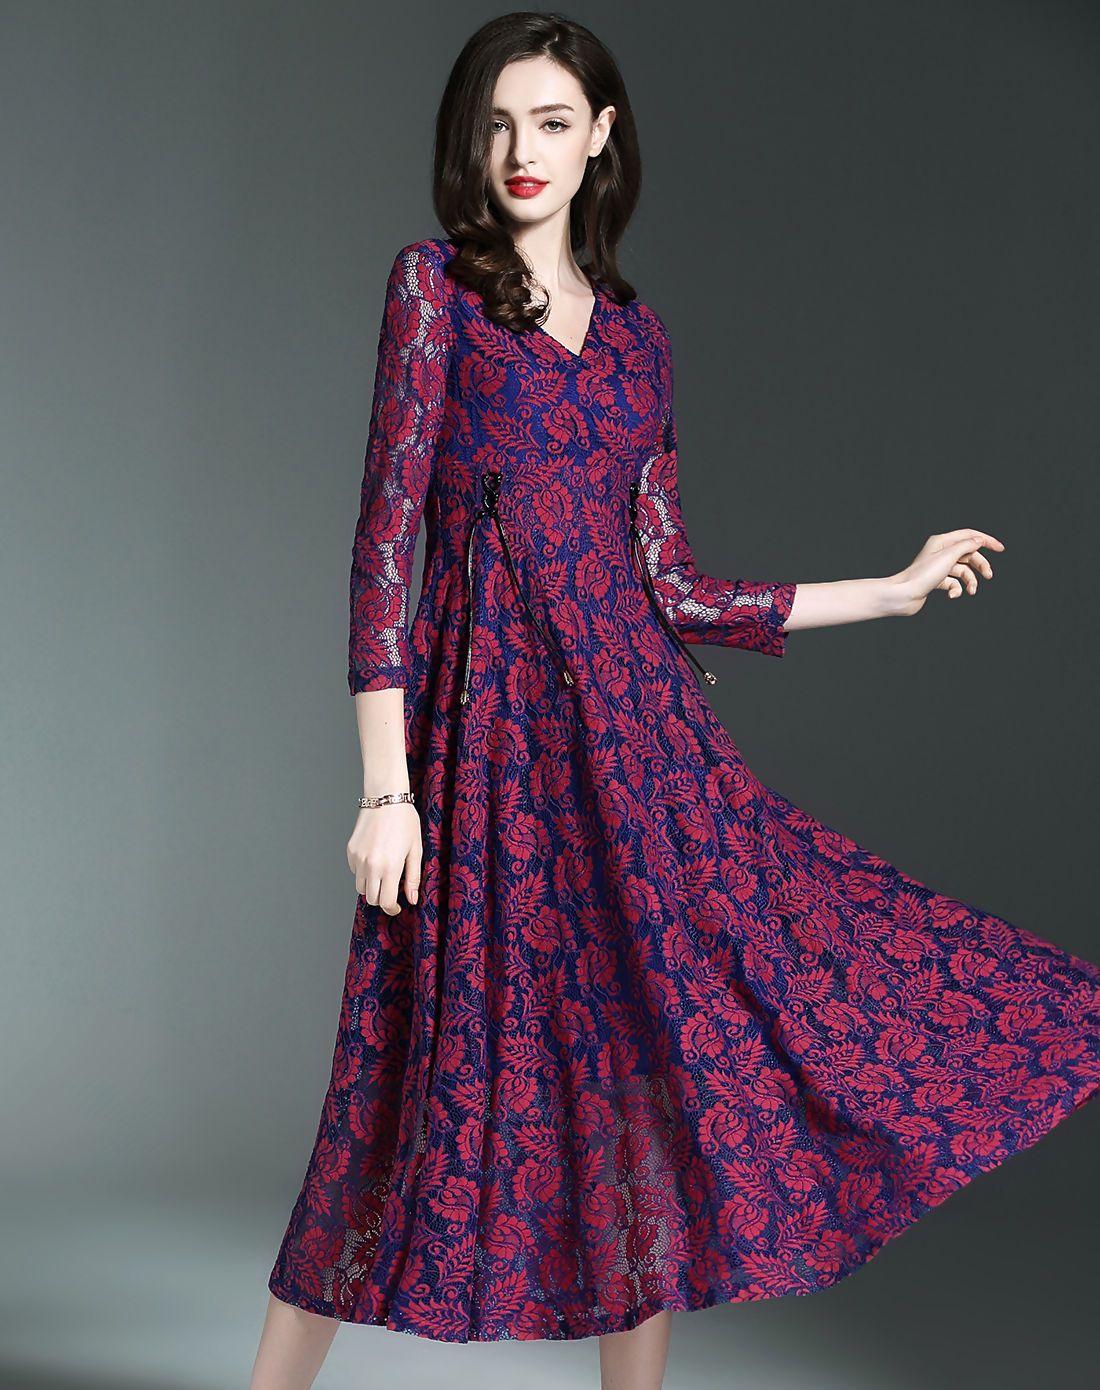 #AdoreWe #VIPme Swing Dresses - ES·DANNUO Purple V-neck Cut-out Lace Swing Midi Dress - AdoreWe.com